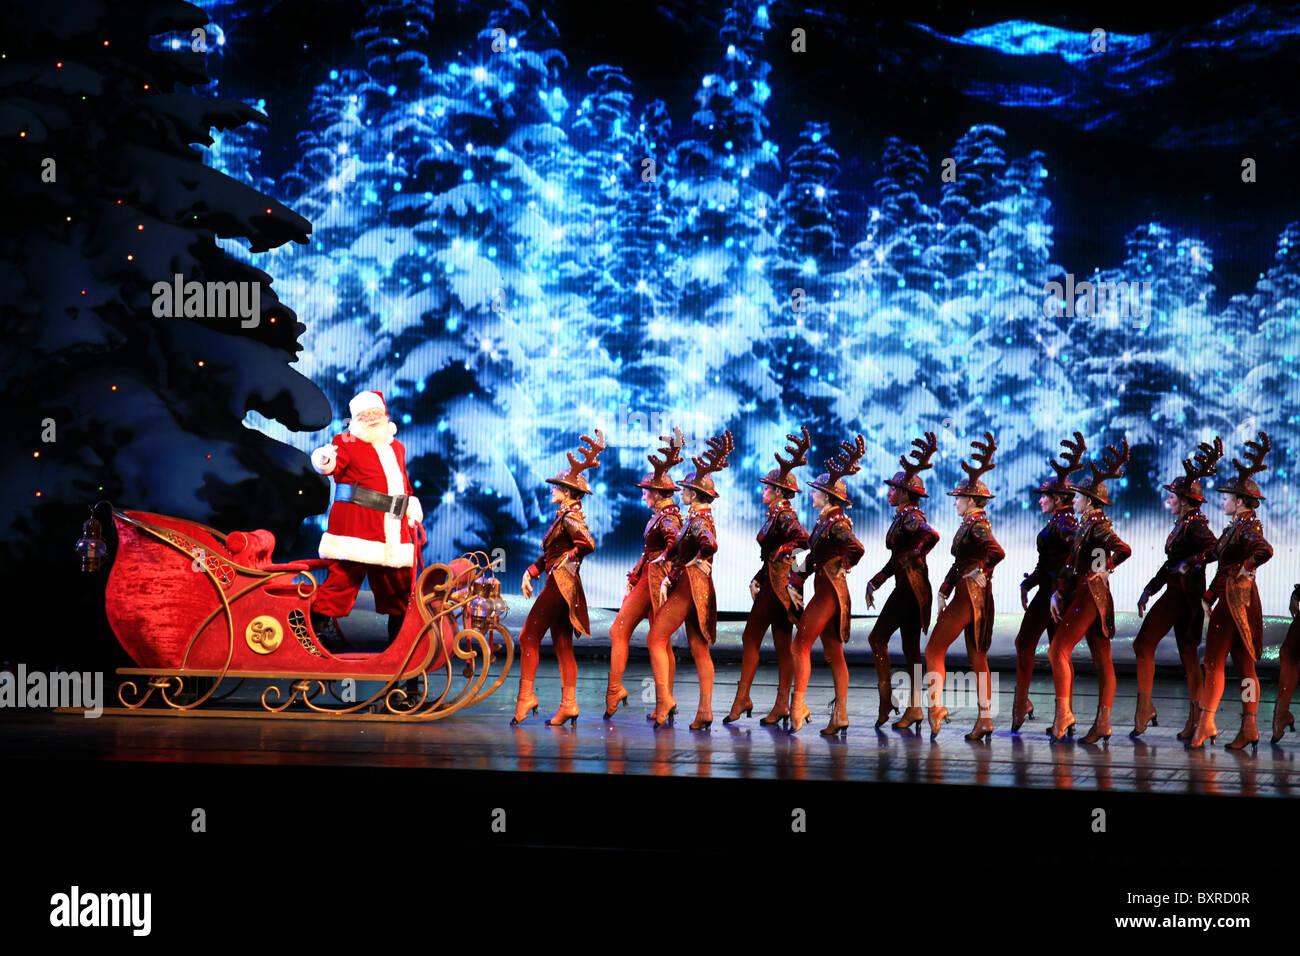 'Sleigh ride' scene - Radio city music hall Christmas spectacular show in New York city 2010 - Stock Image